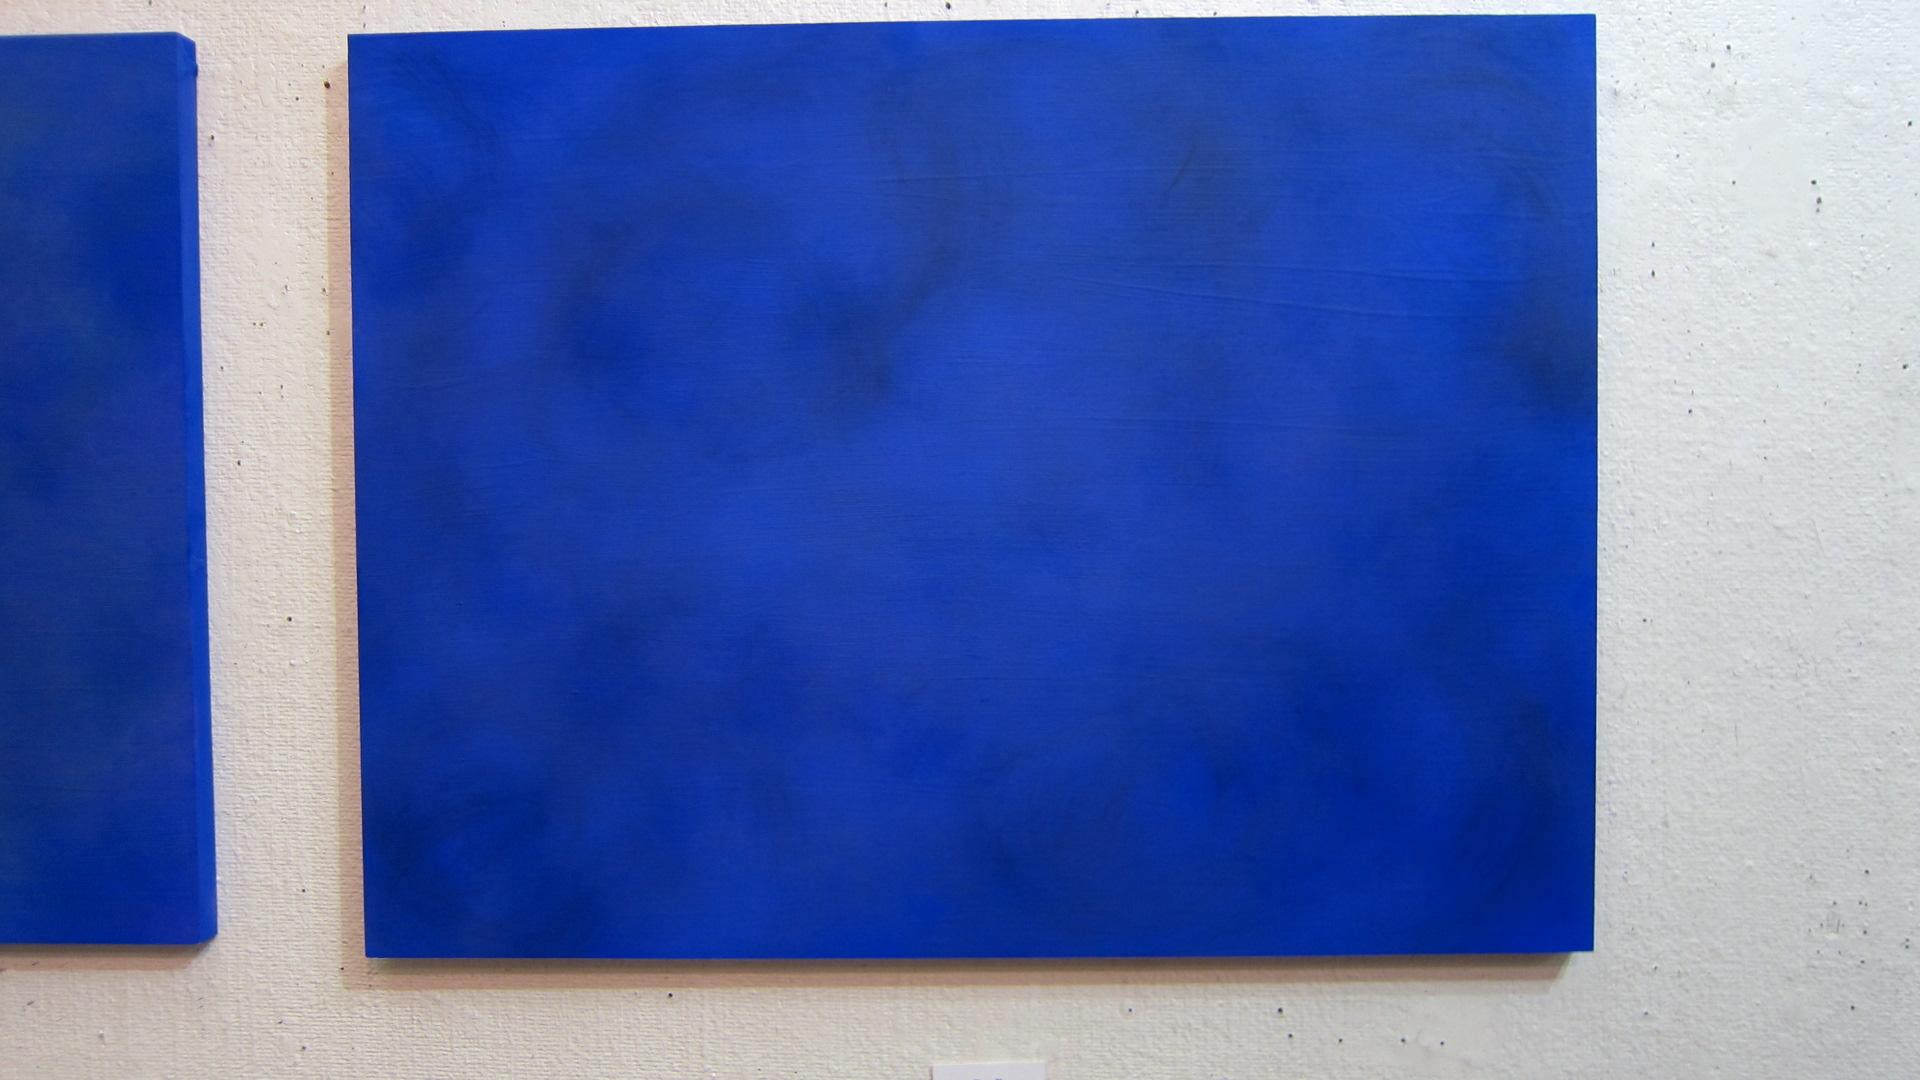 2354) 「LA`TAPIO -Ⅱ- Exhibition」 たぴお 1月27日(月)~2月15日(土)_f0126829_10583723.jpg